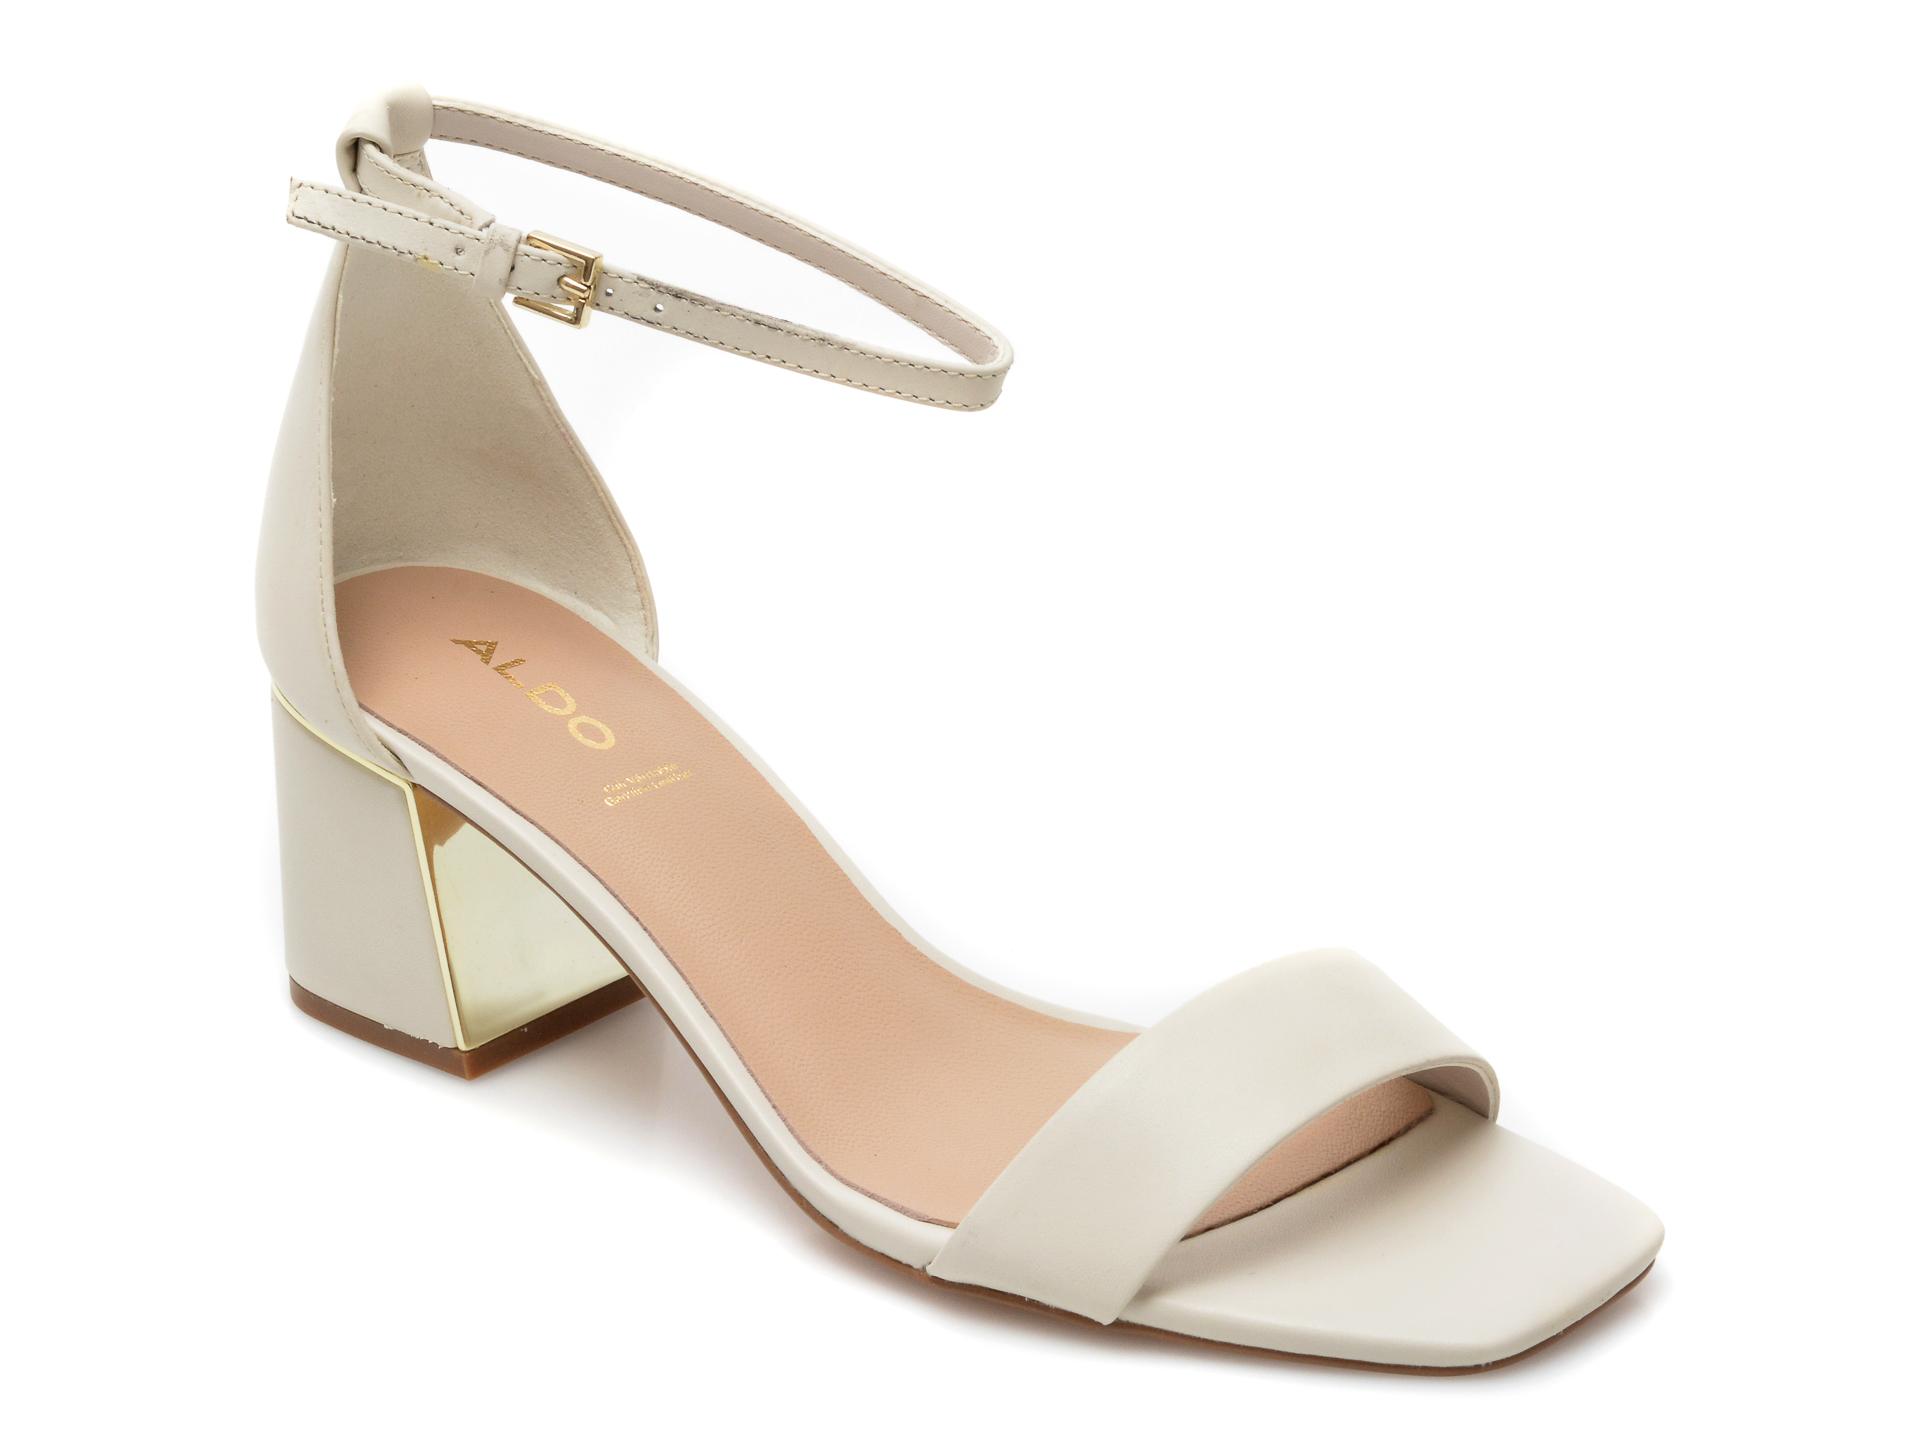 Sandale ALDO albe, Kedeaviel100, din piele naturala imagine otter.ro 2021